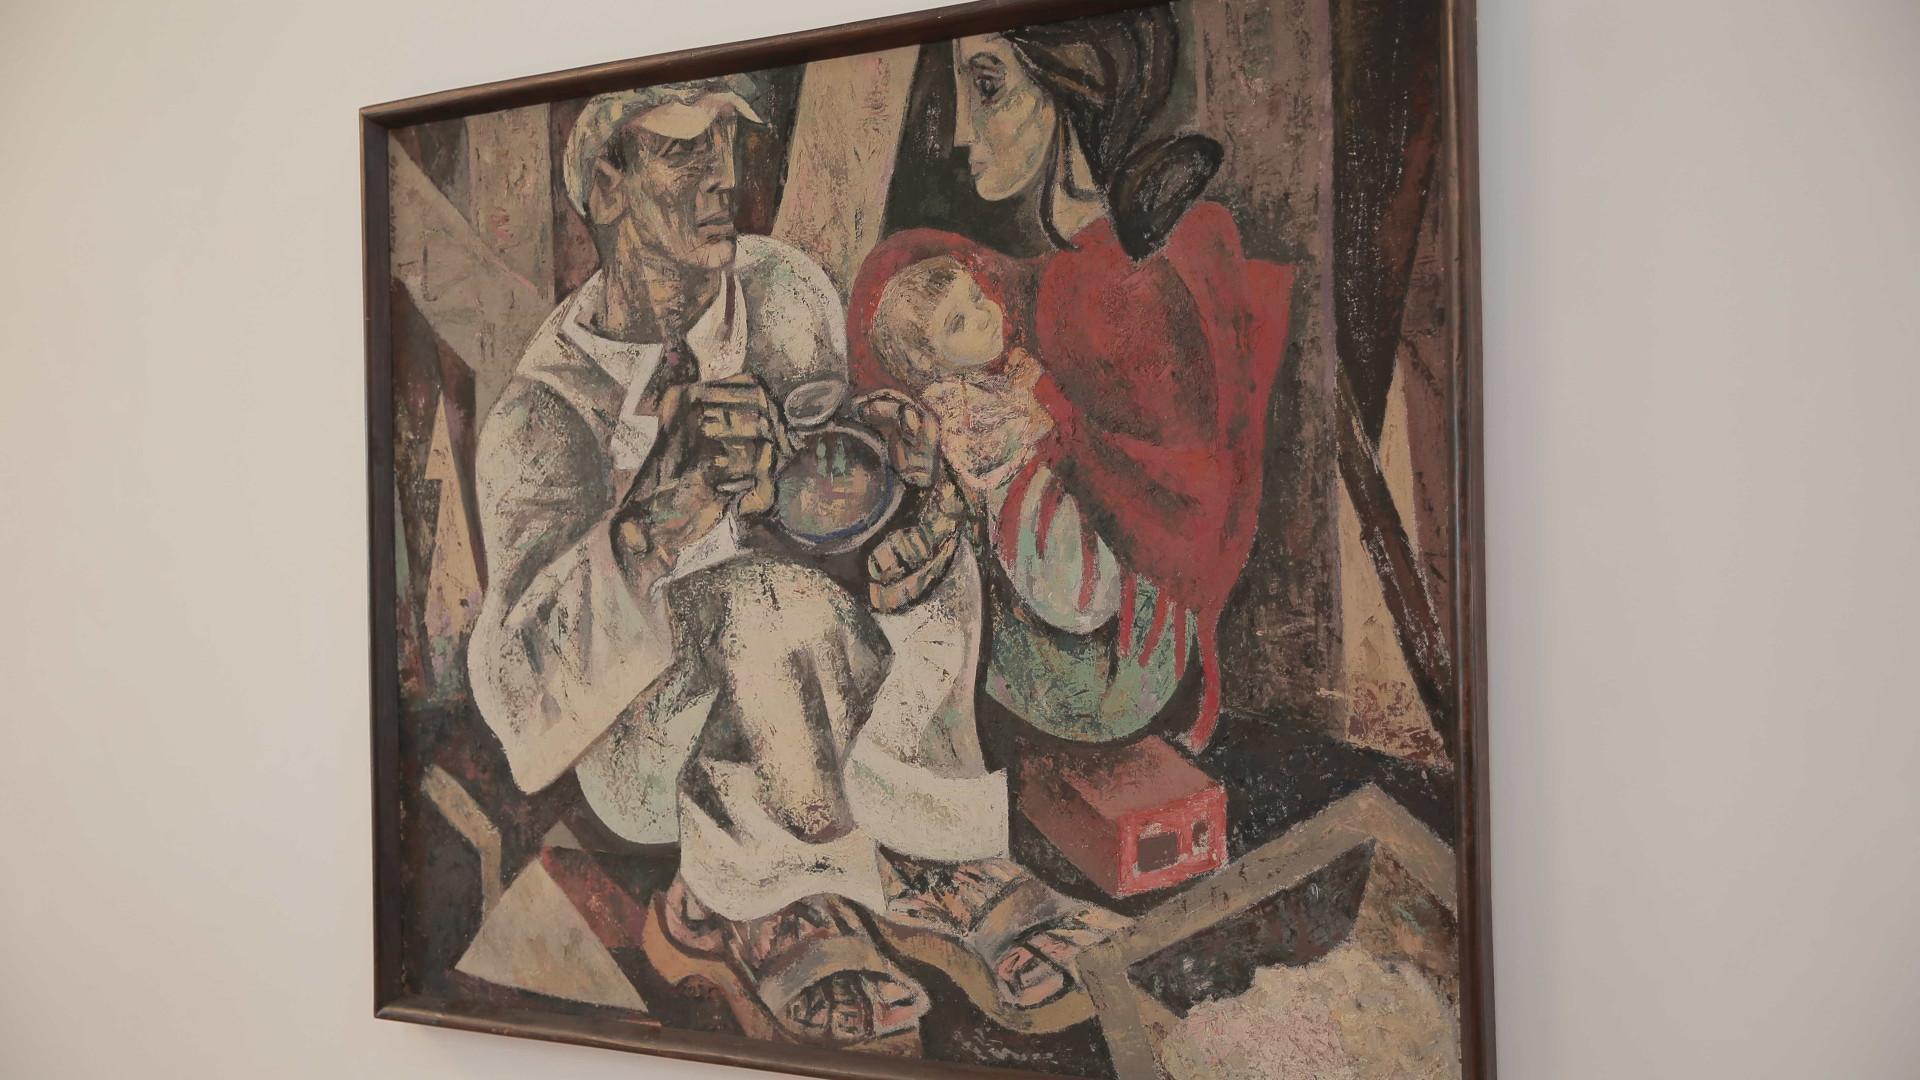 De Foz Côa a Lisboa, a obra de Júlio Pomar está exposta ao público